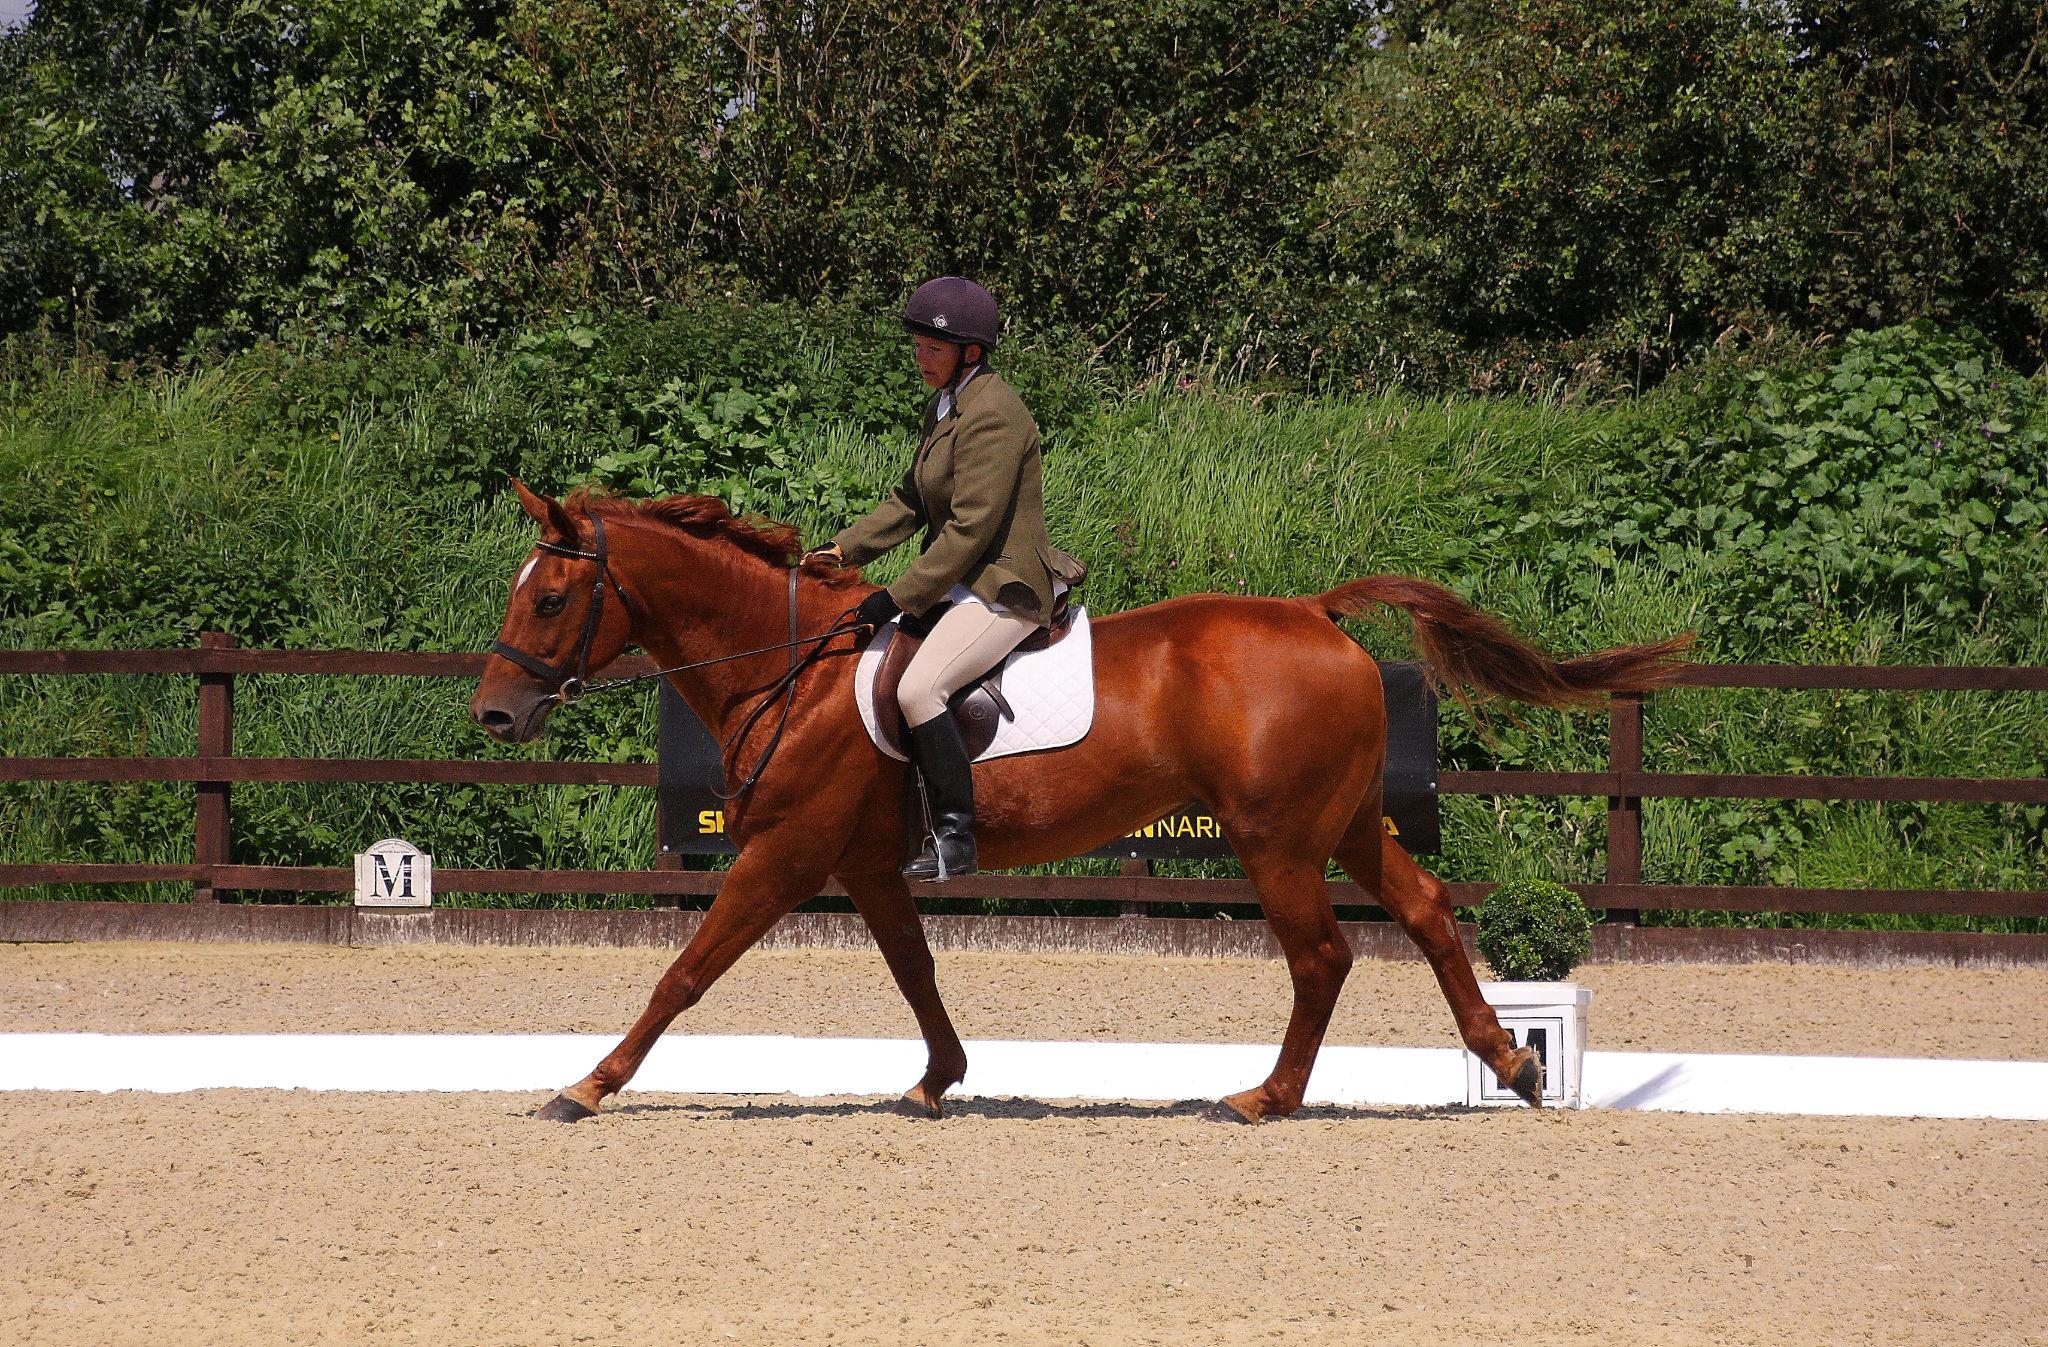 Dressage Parley Equestrian Centre